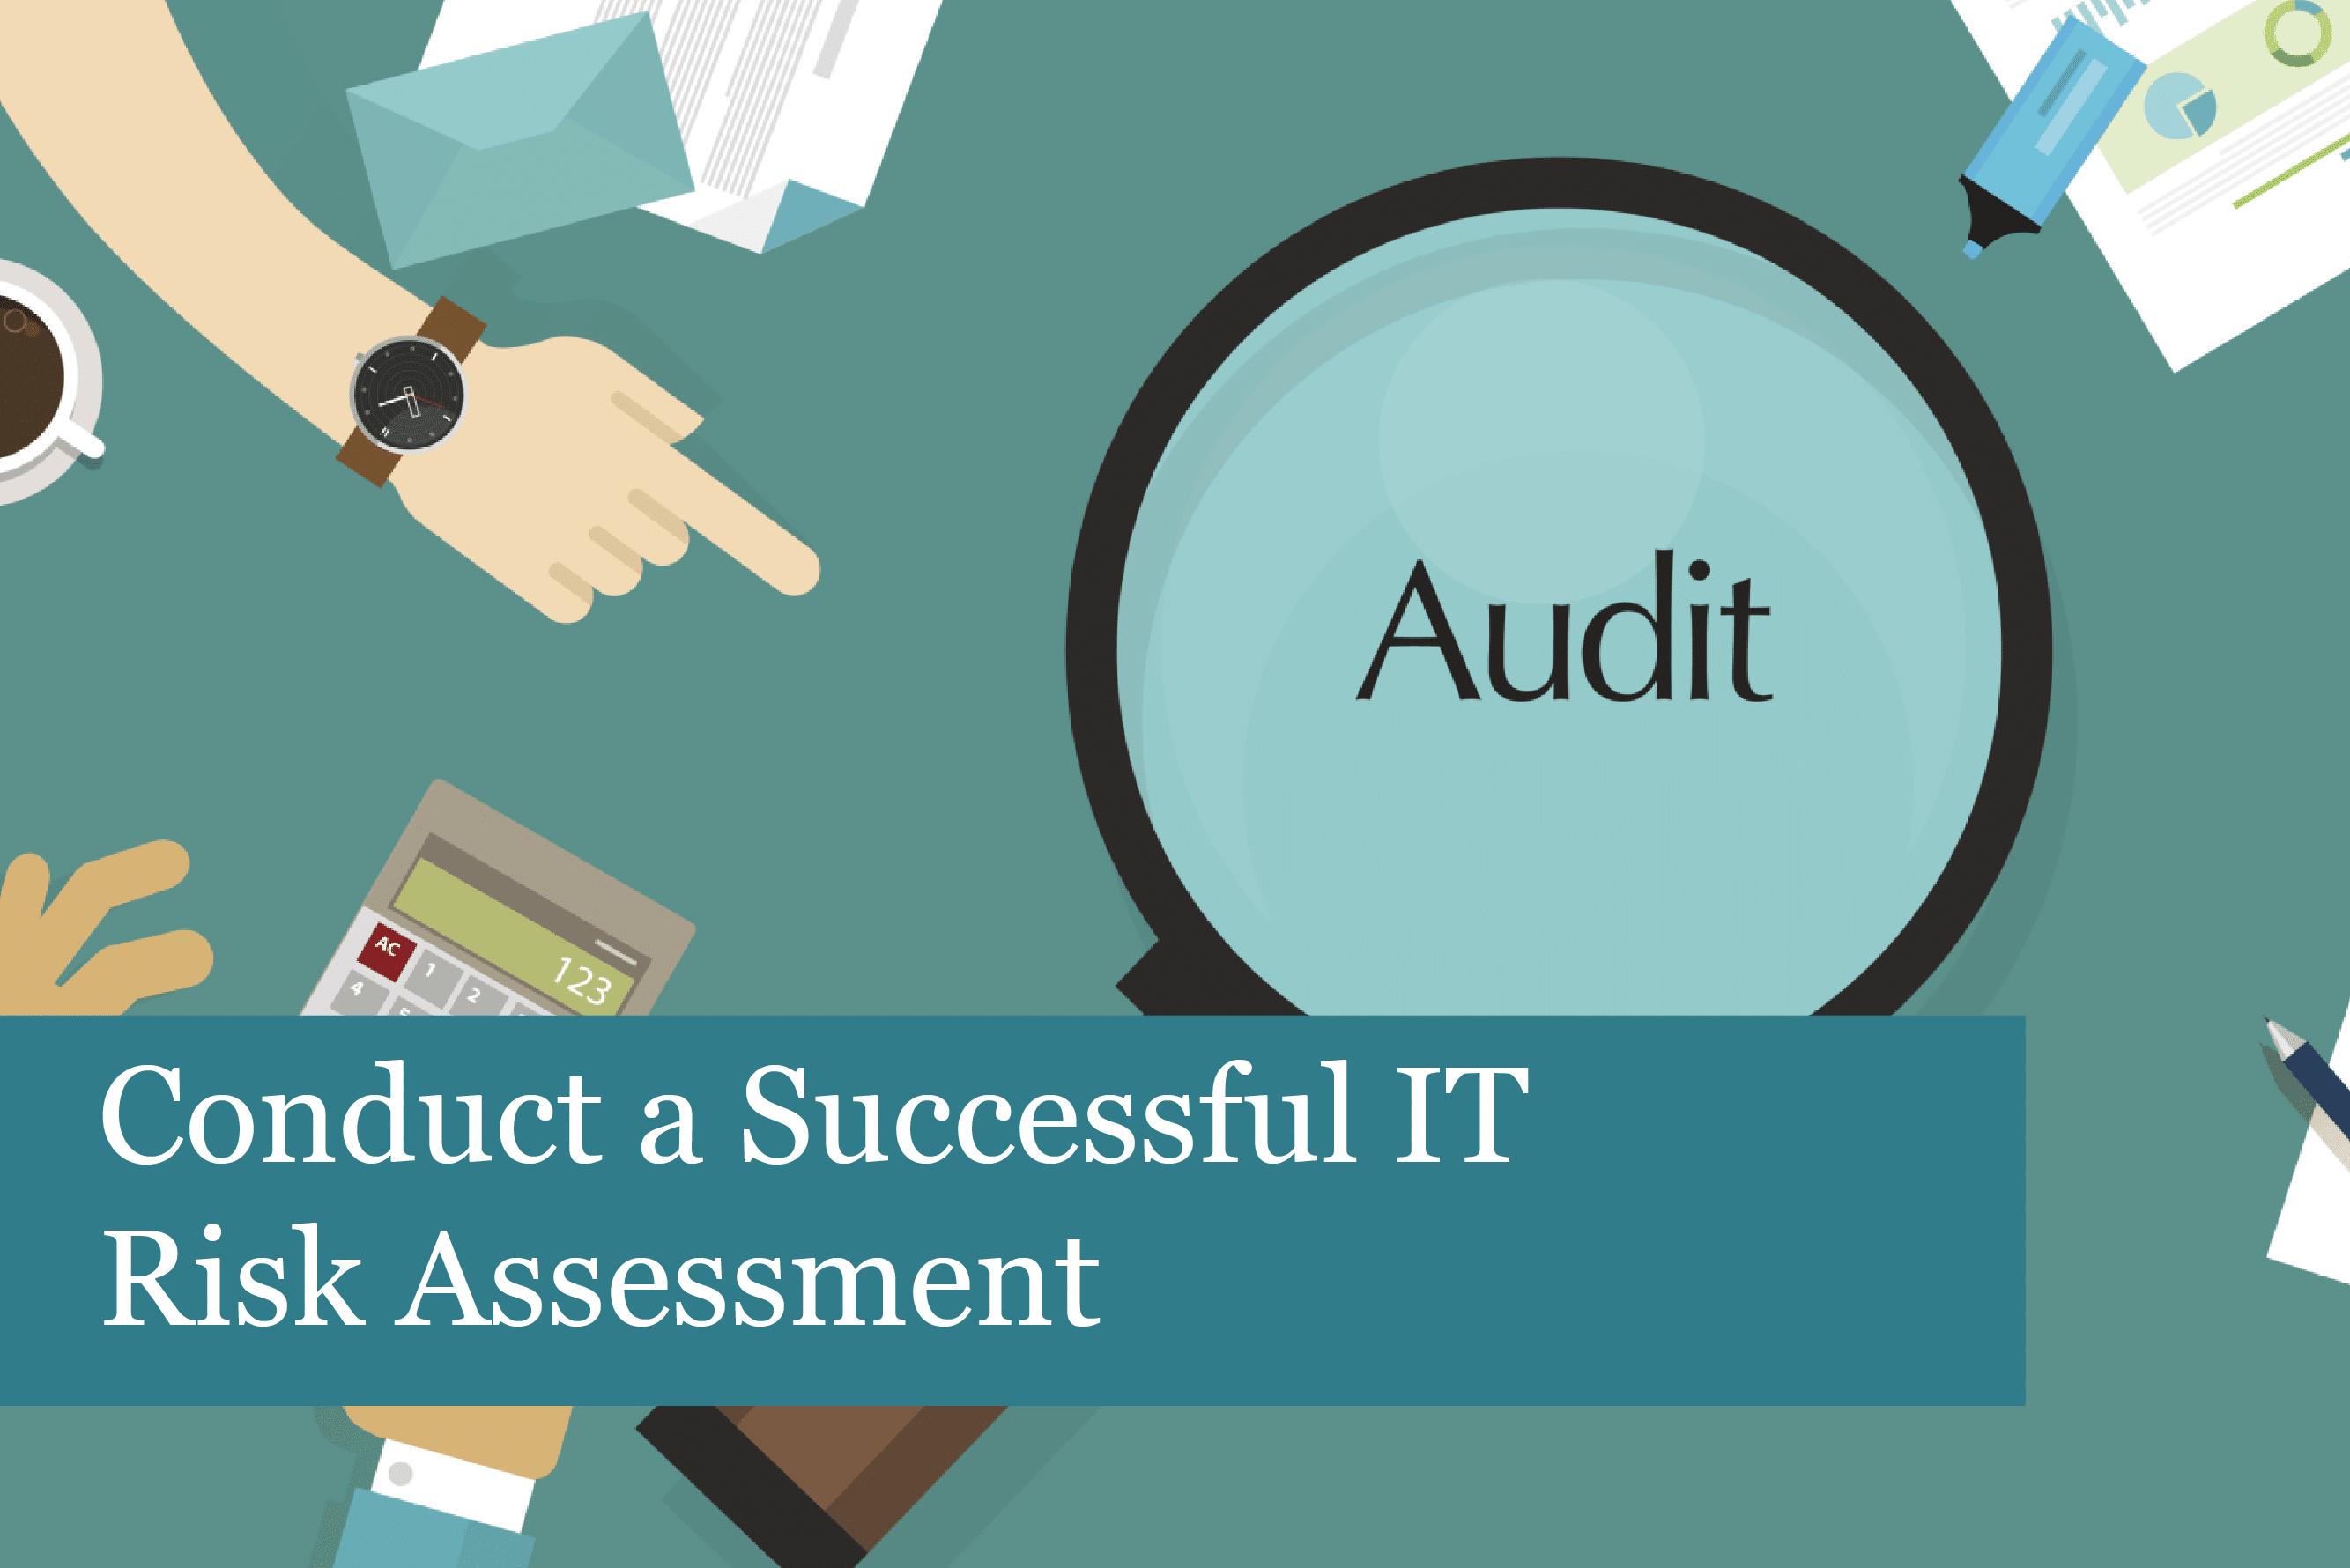 Conduct a Successful IT Risk Assessment